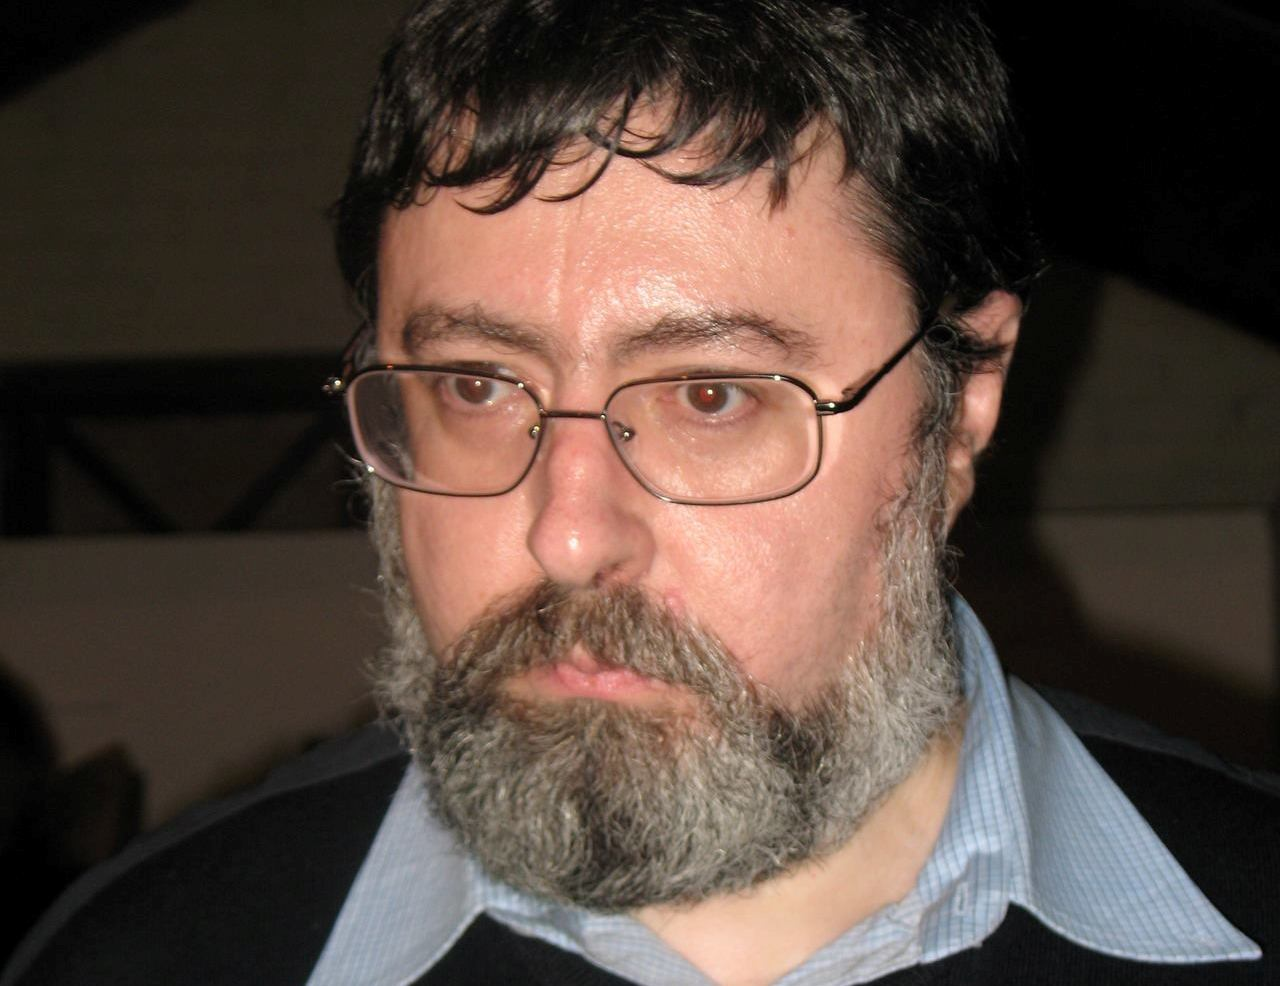 Не стало писателя ипублициста Романа Арбитмана